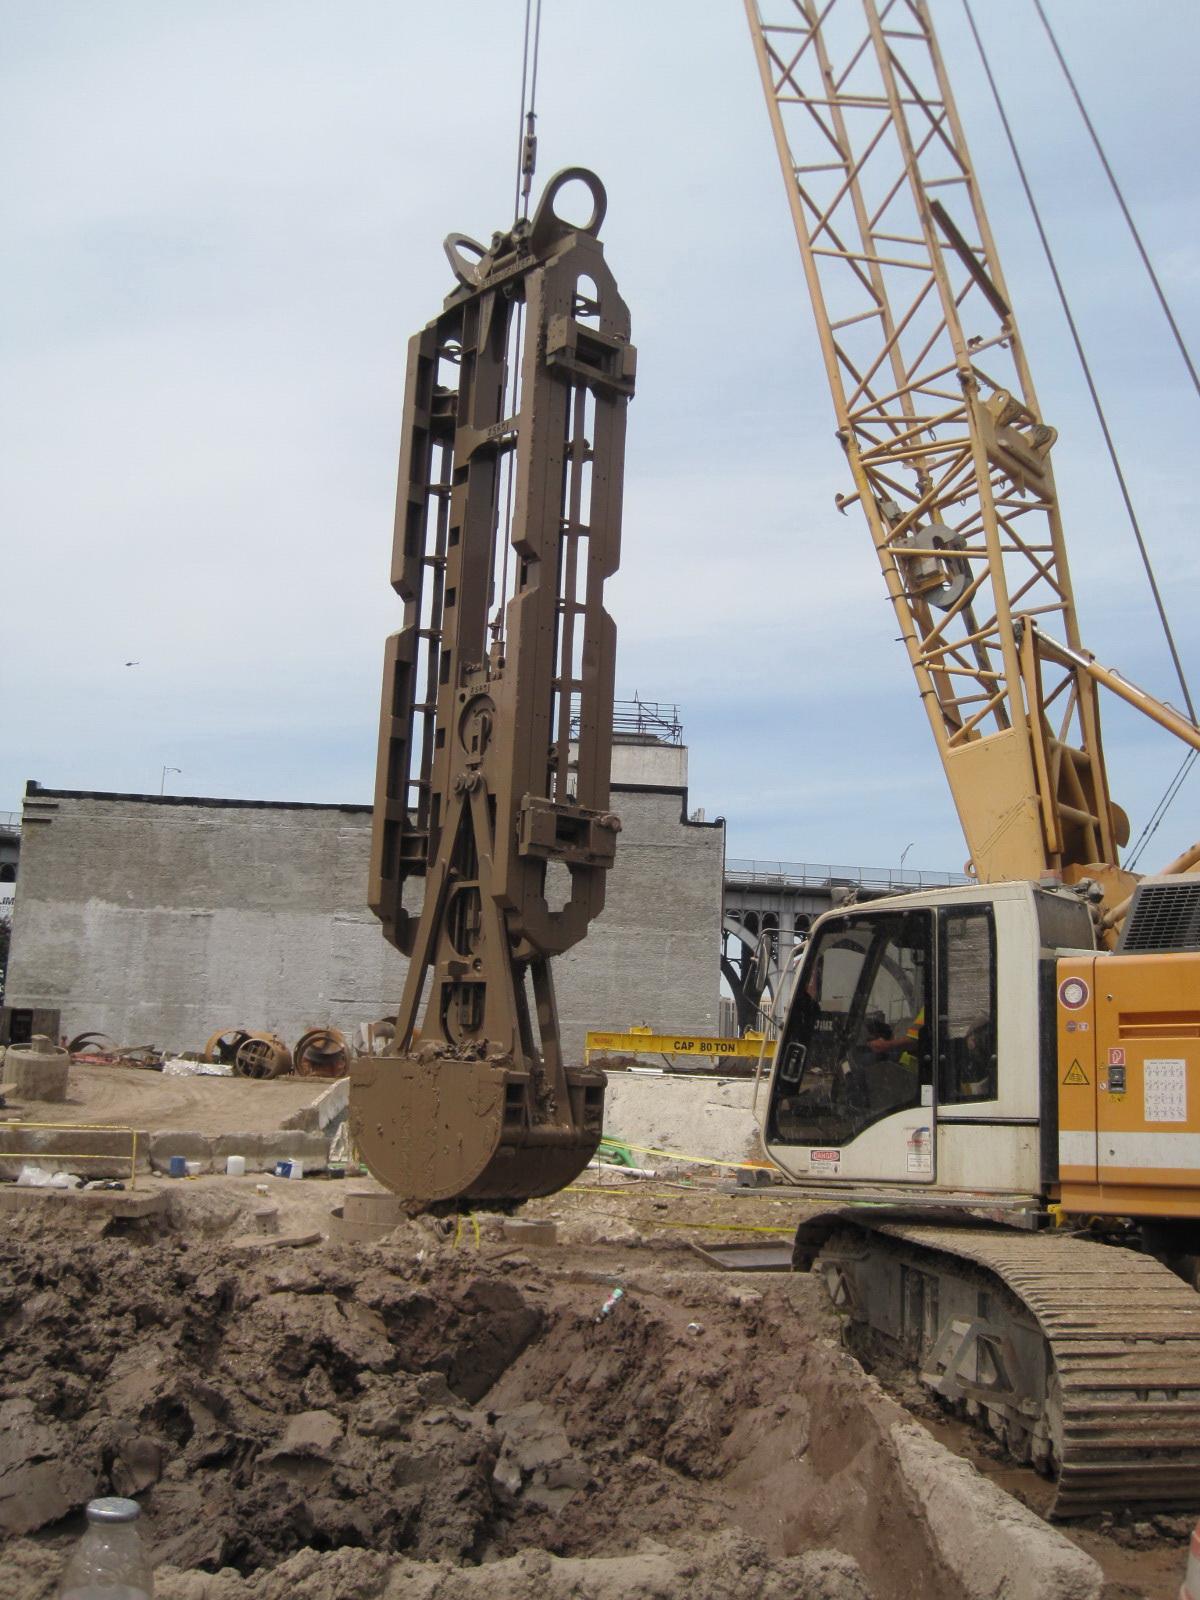 Clamshell Buckets 187 Equipment Excavating Slurry Walls